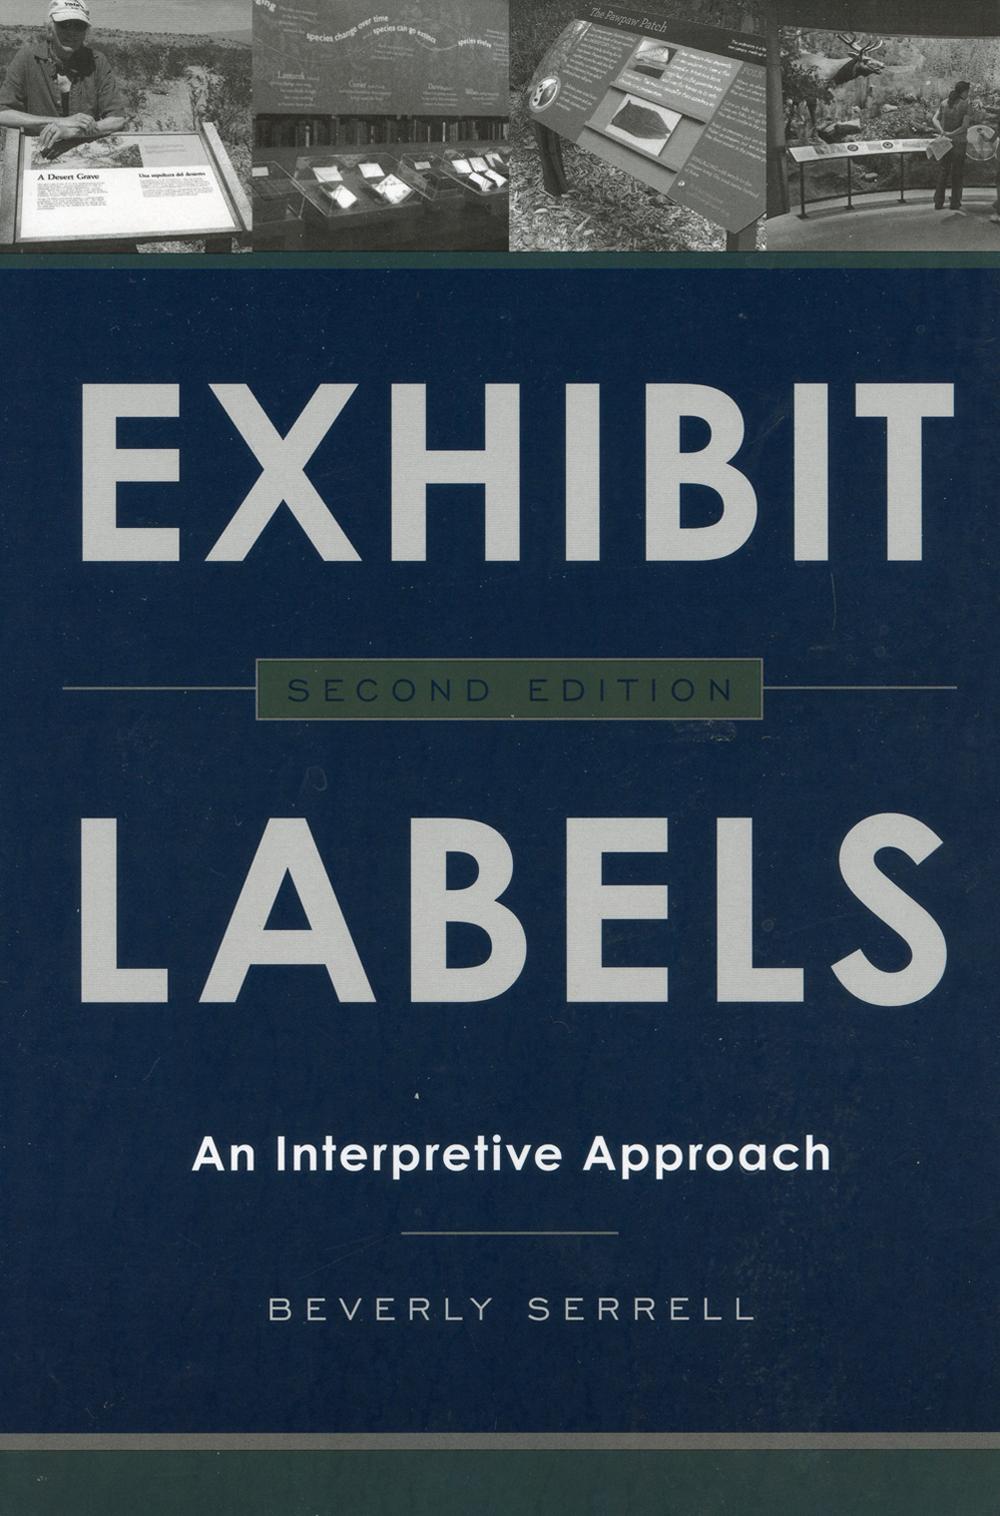 Exhibit Labels: An Interpretive Approach (2nd Edition)